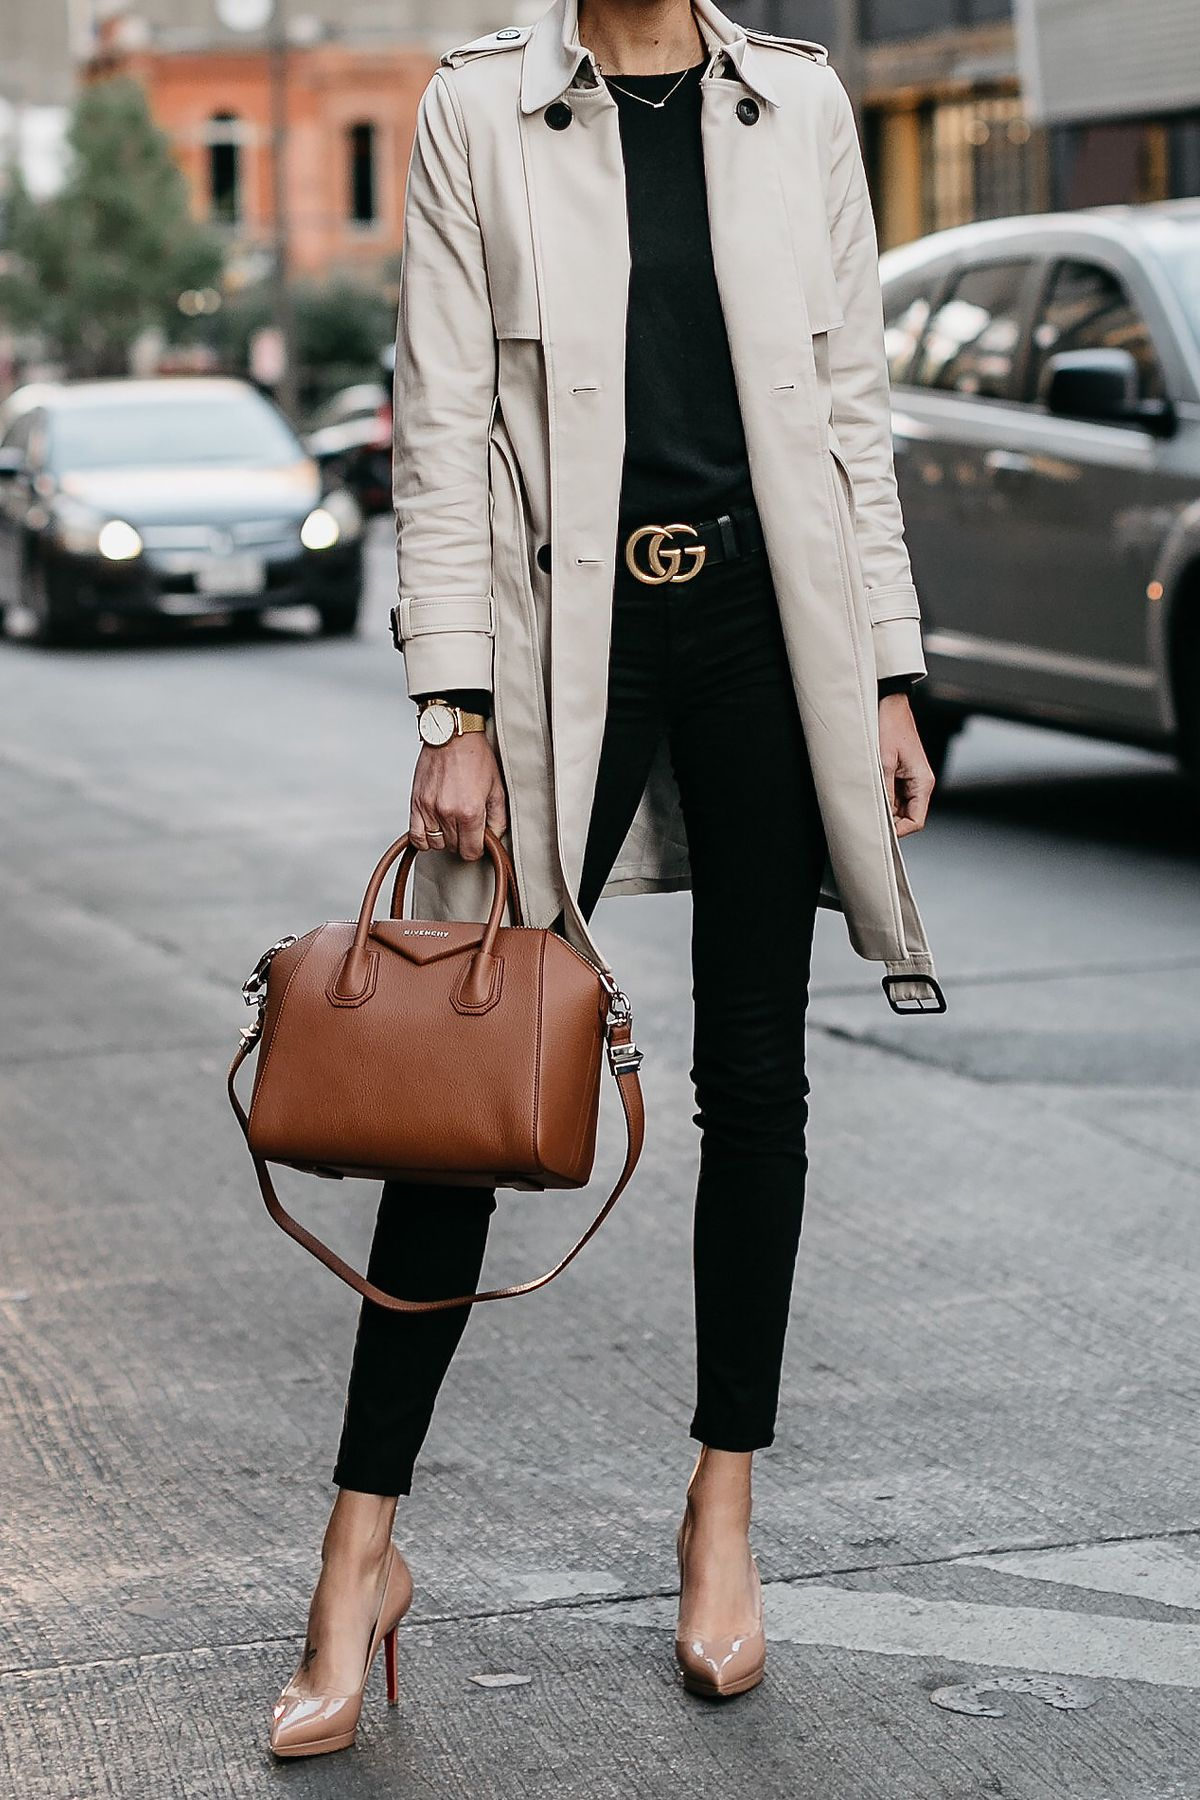 f682cfcd9e Club Monaco Trench Coat Black Sweater Black Skinny Jeans Gucci Marmont Belt  Nude Pumps Givenchy Antigona Cognac Satchel Fashion Jackson Dallas Blogger  ...